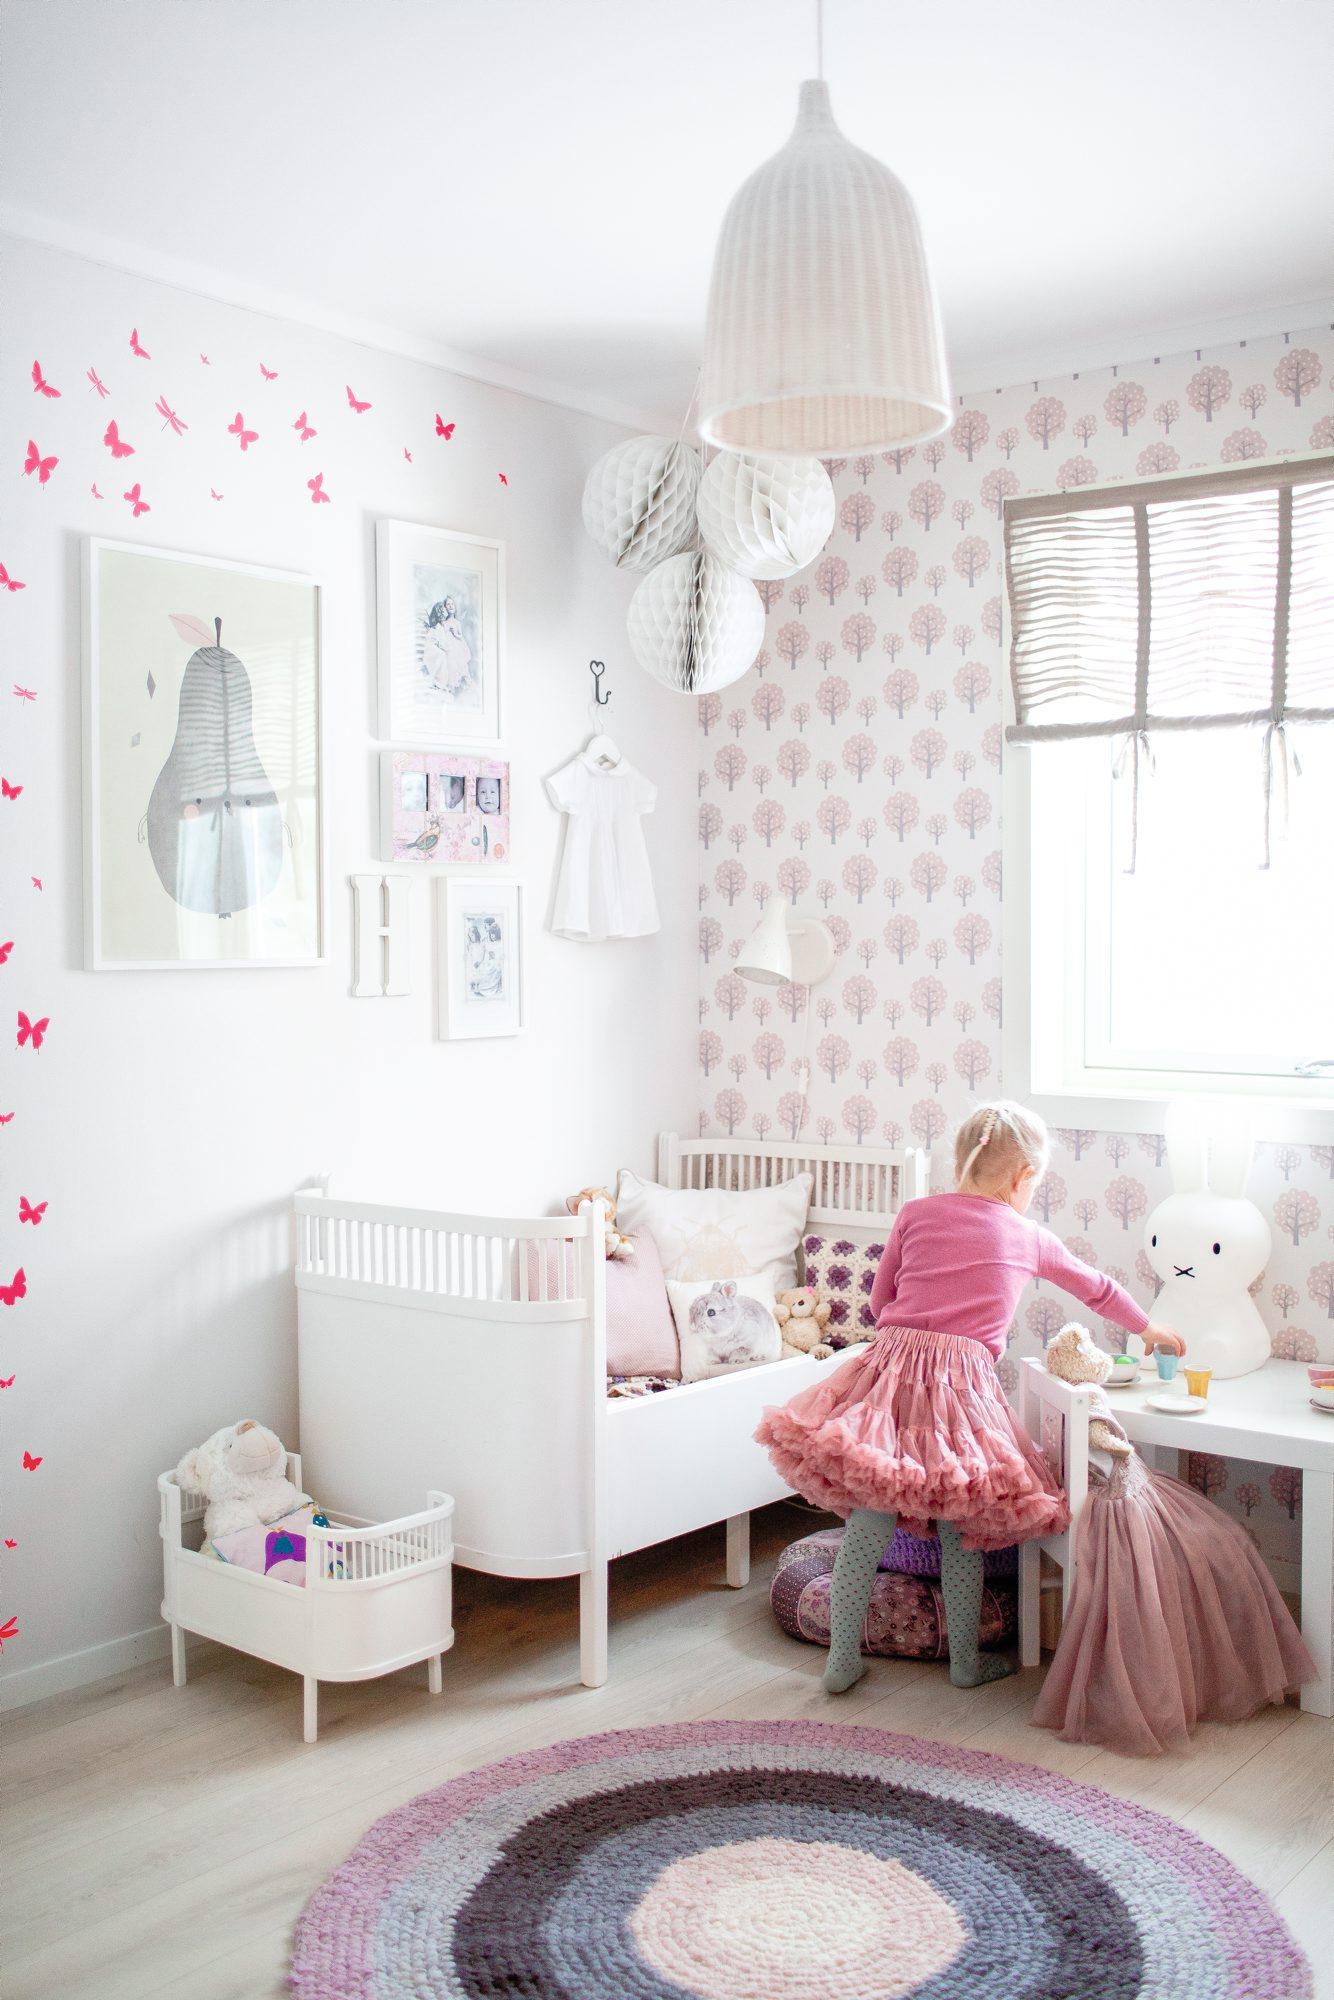 carina jokernord boligportrett barnerom